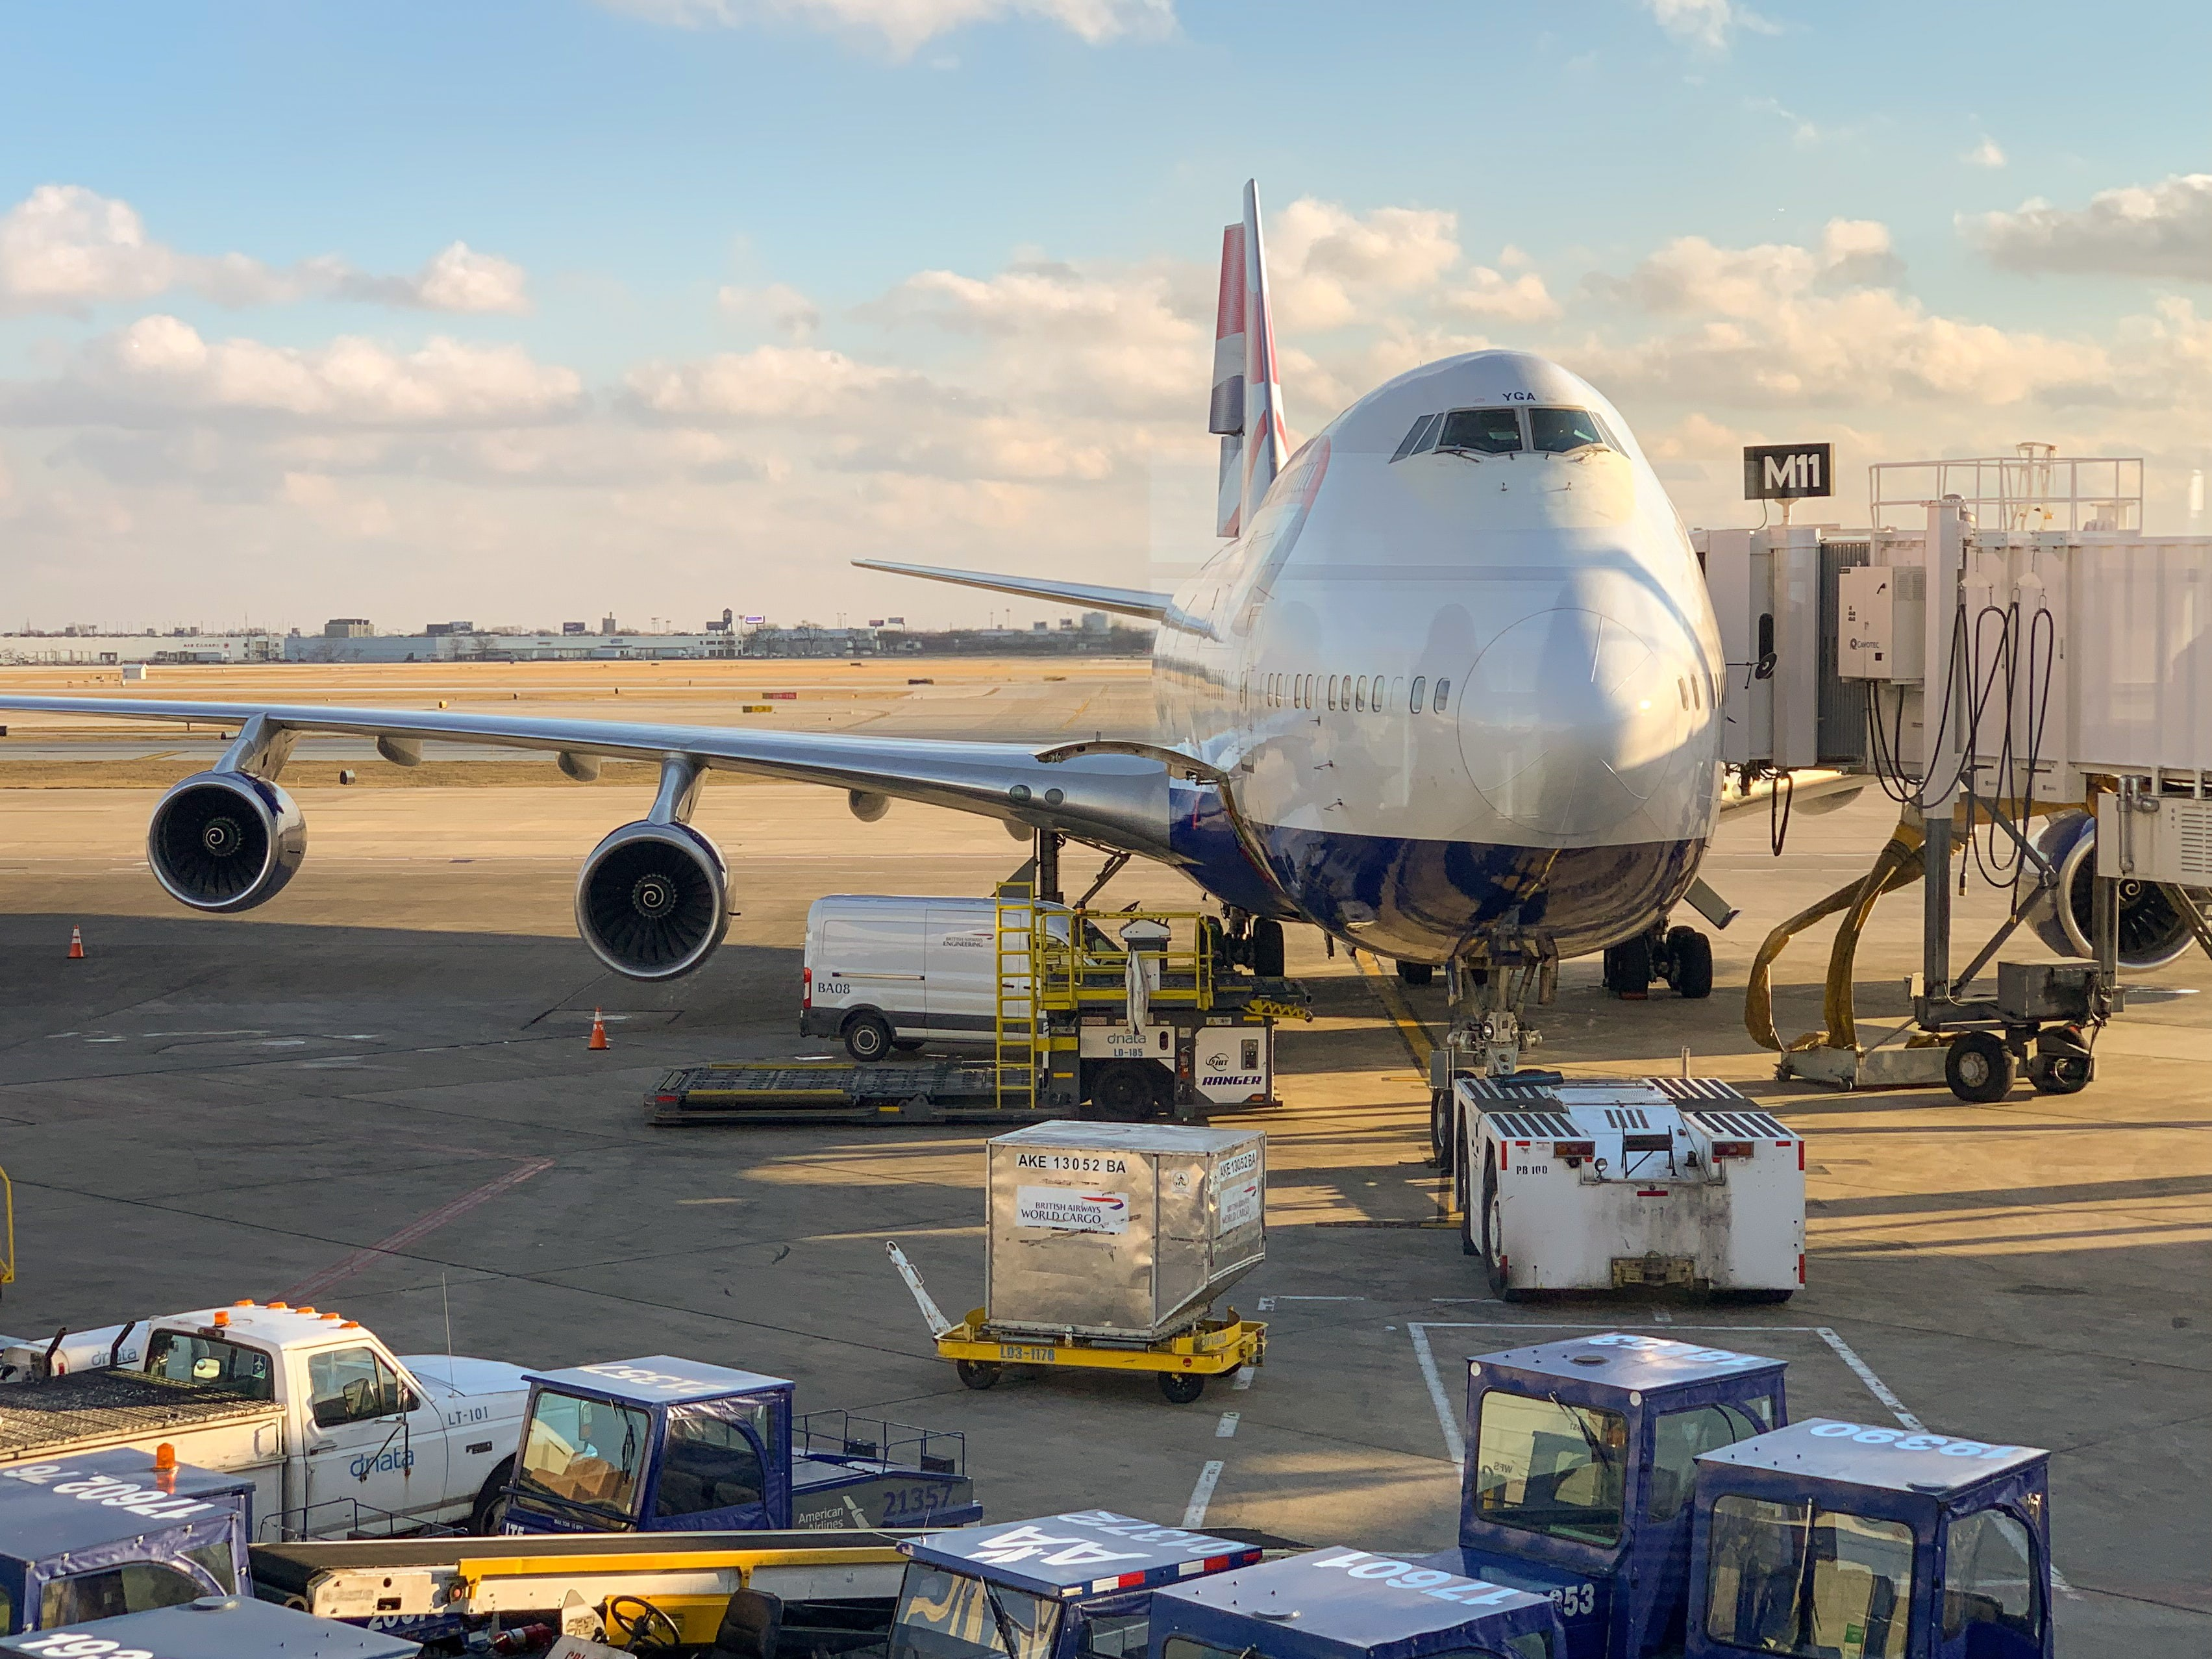 Coronavirus Update: Air Cargo in a Tough Position